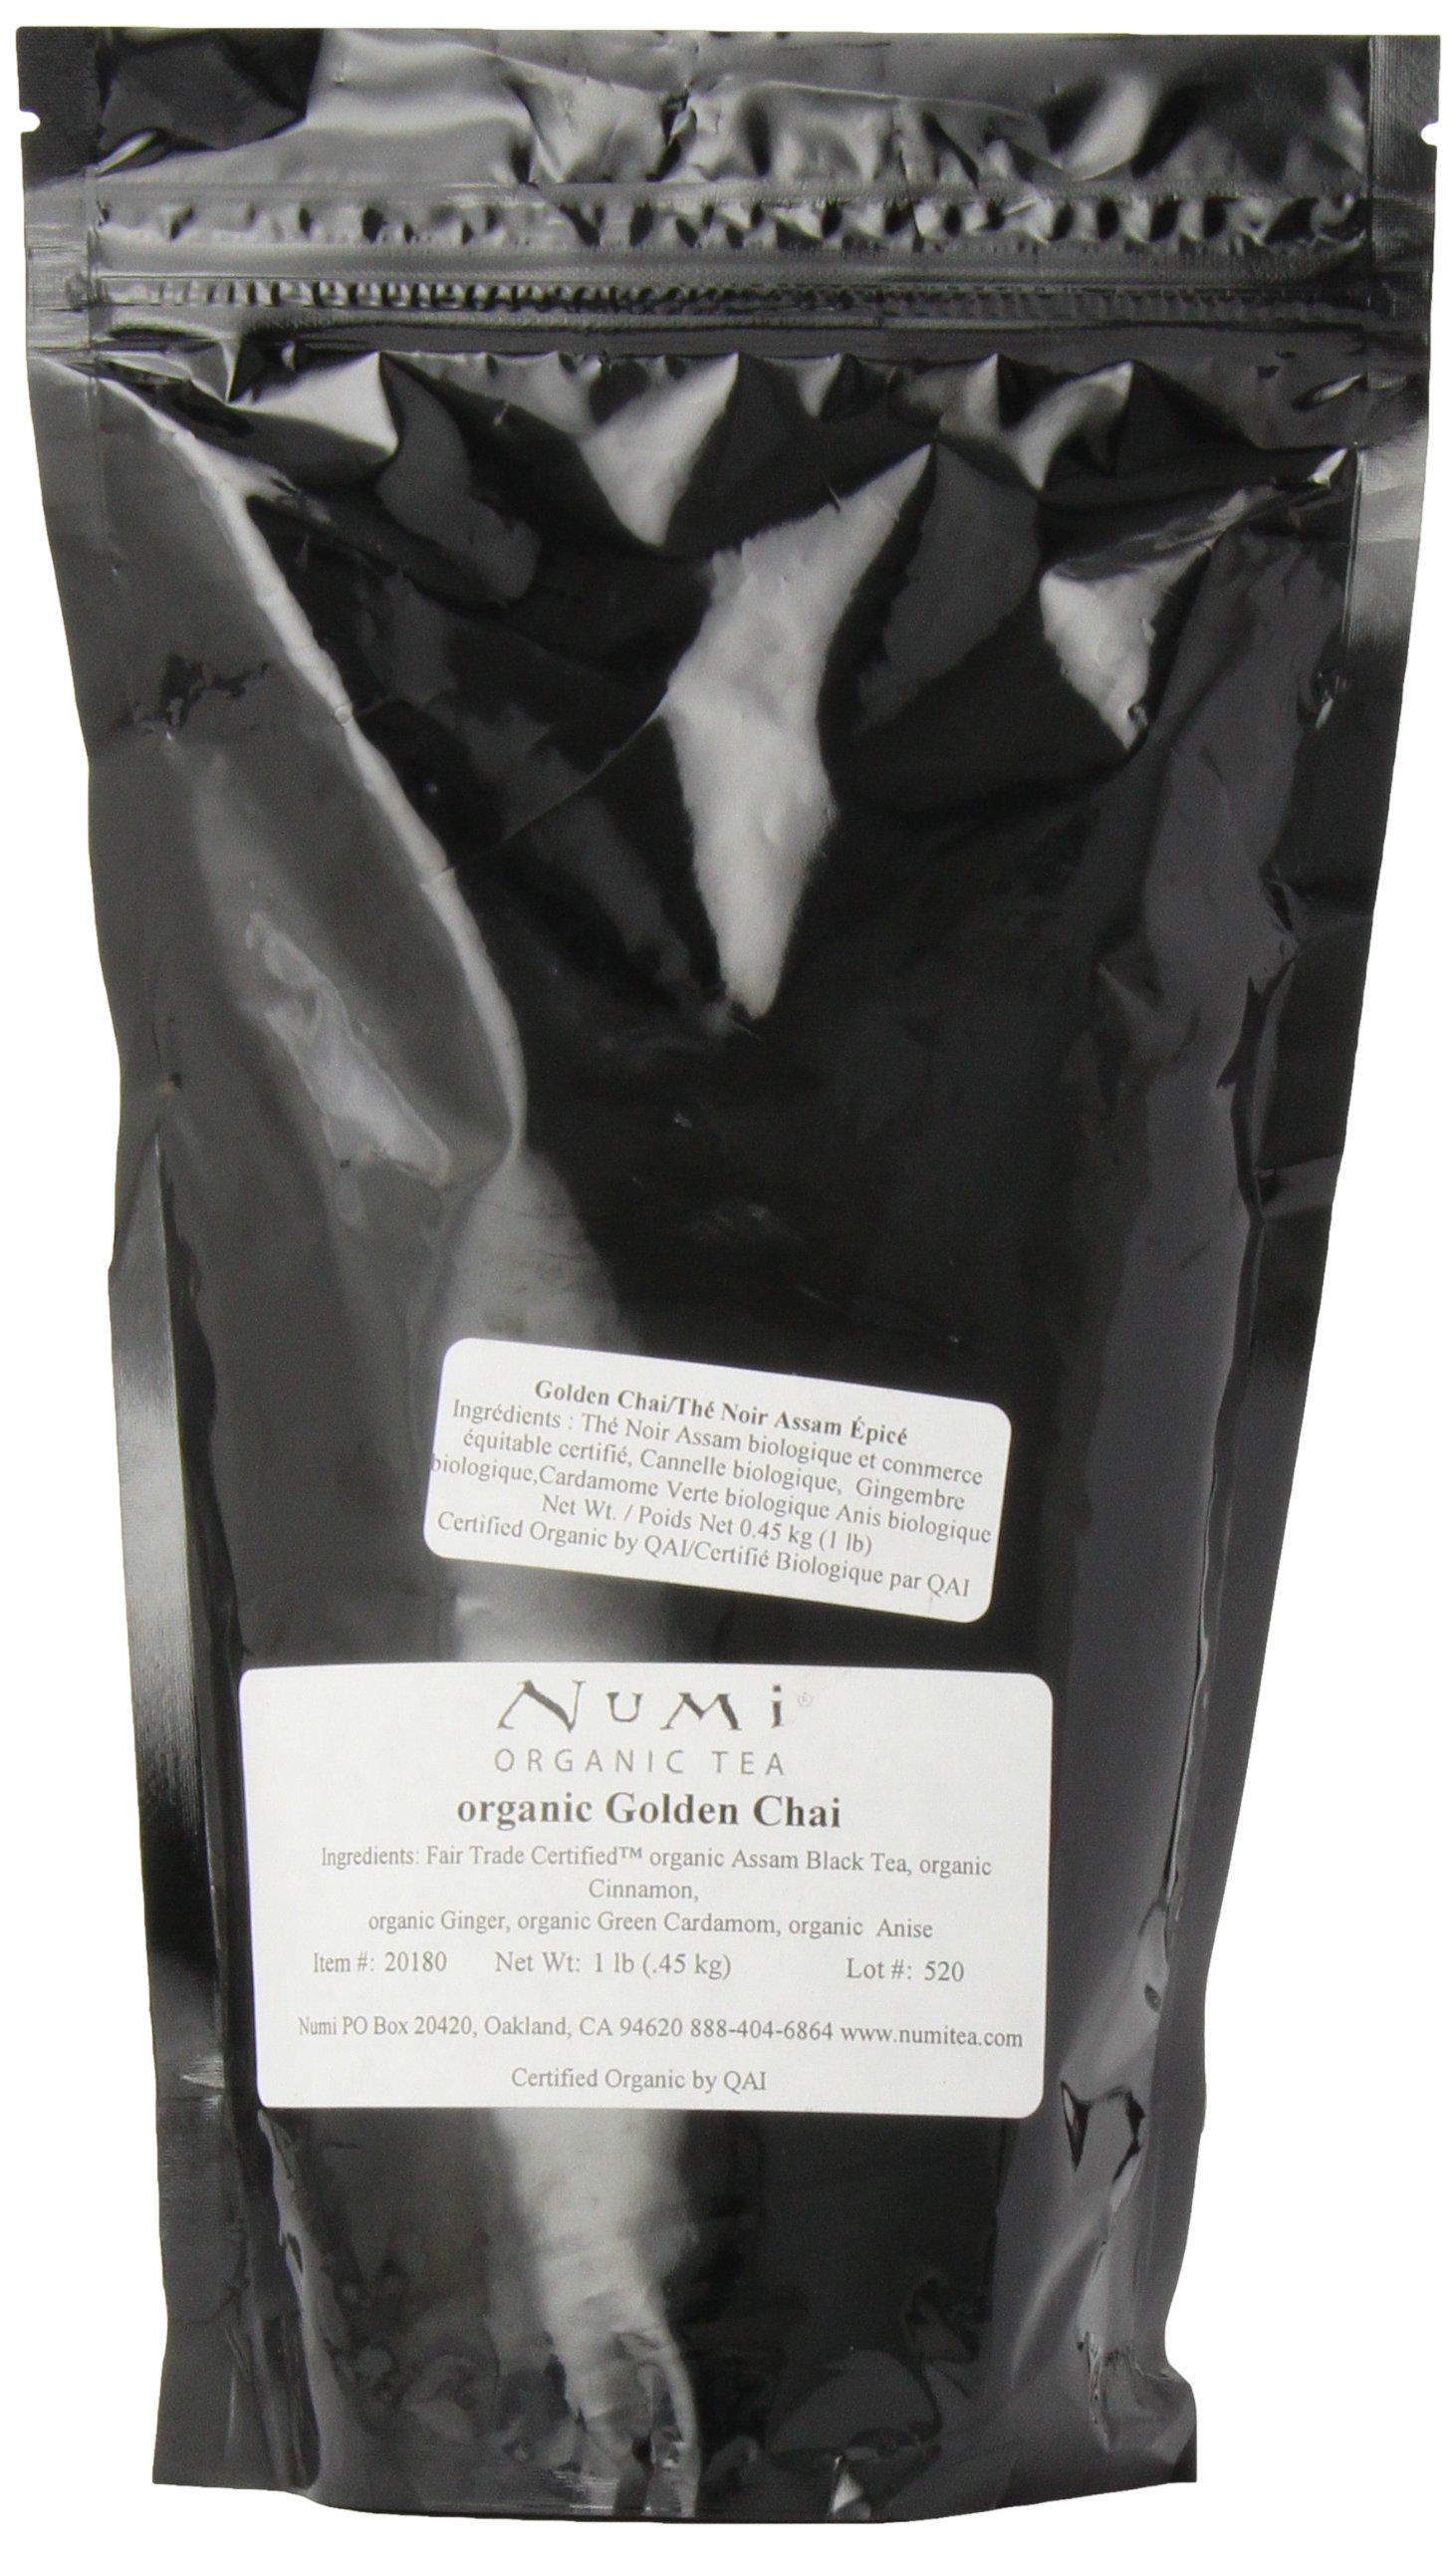 Numi Organic Tea Golden Chai, 16 Ounce Pouch (Pack of 6), Loose Leaf Black Tea by Numi Organic Tea (Image #3)